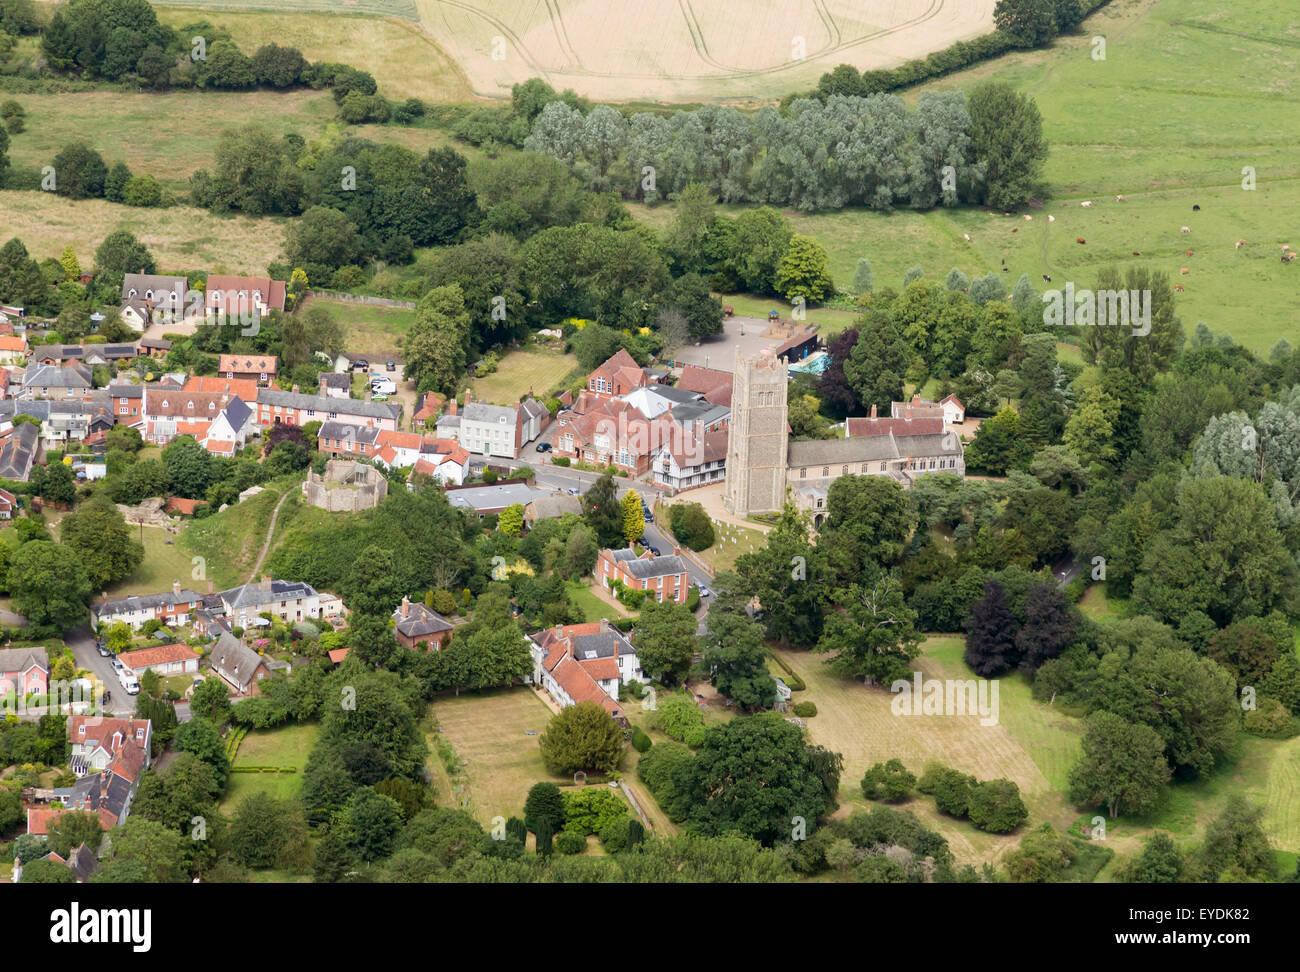 aerial photo of Eye in Suffolk, UK - Stock Image